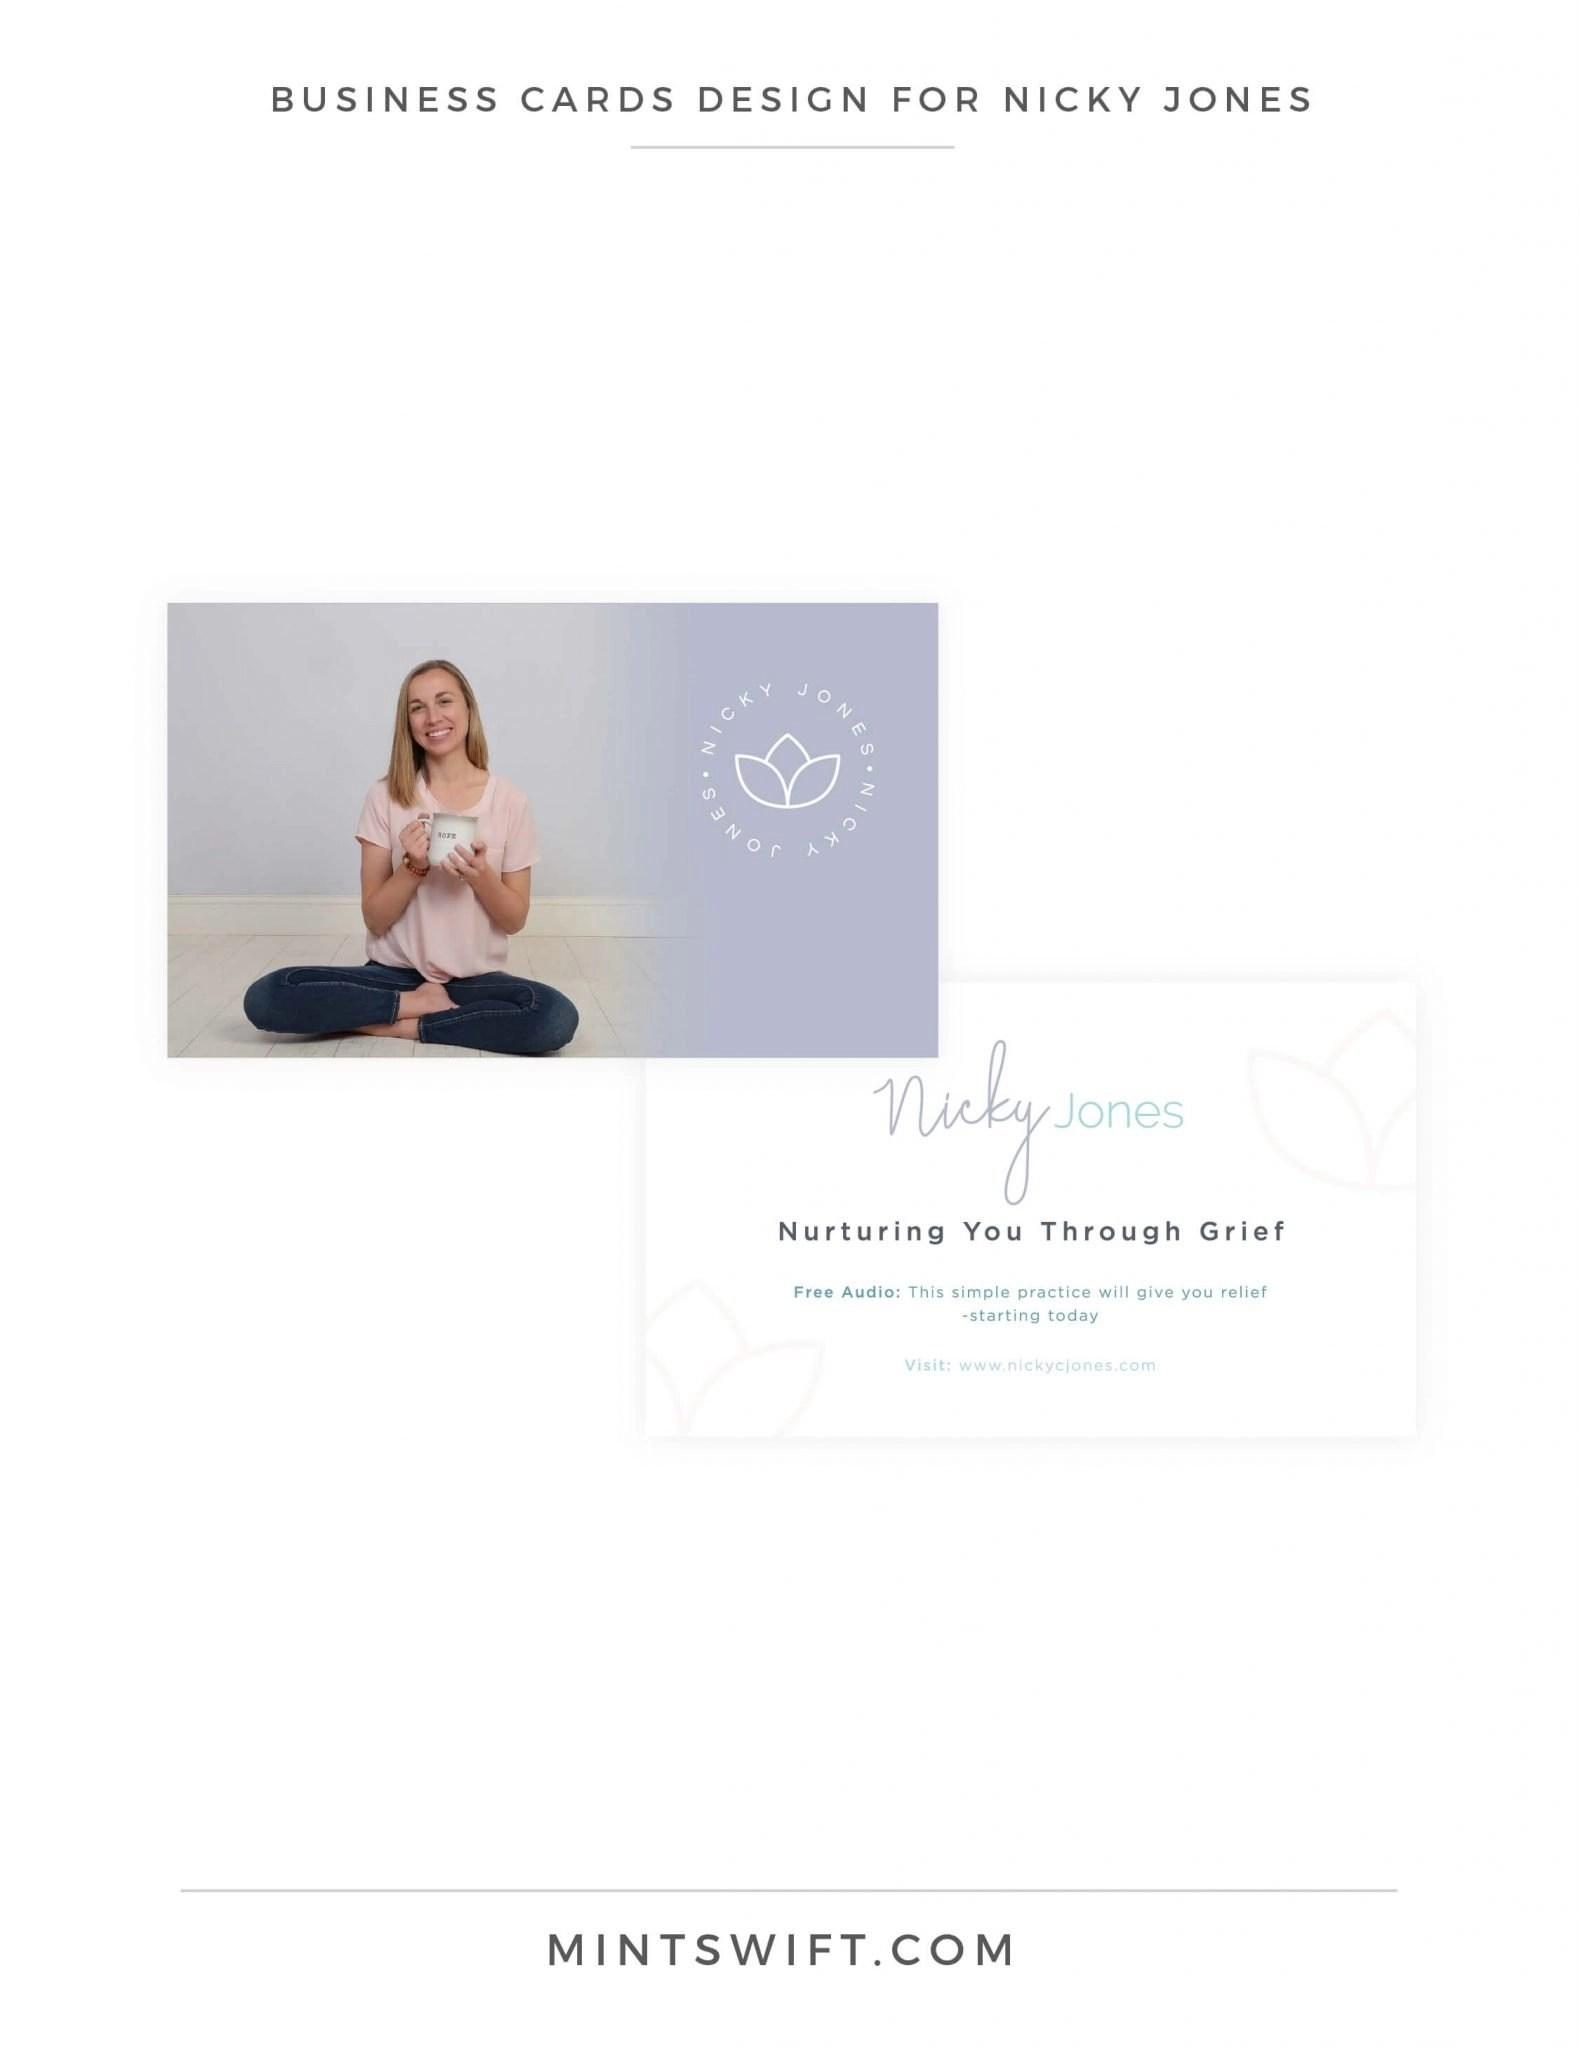 Nicky Jones - Business Cards Design - Brand Design Package - MintSwift